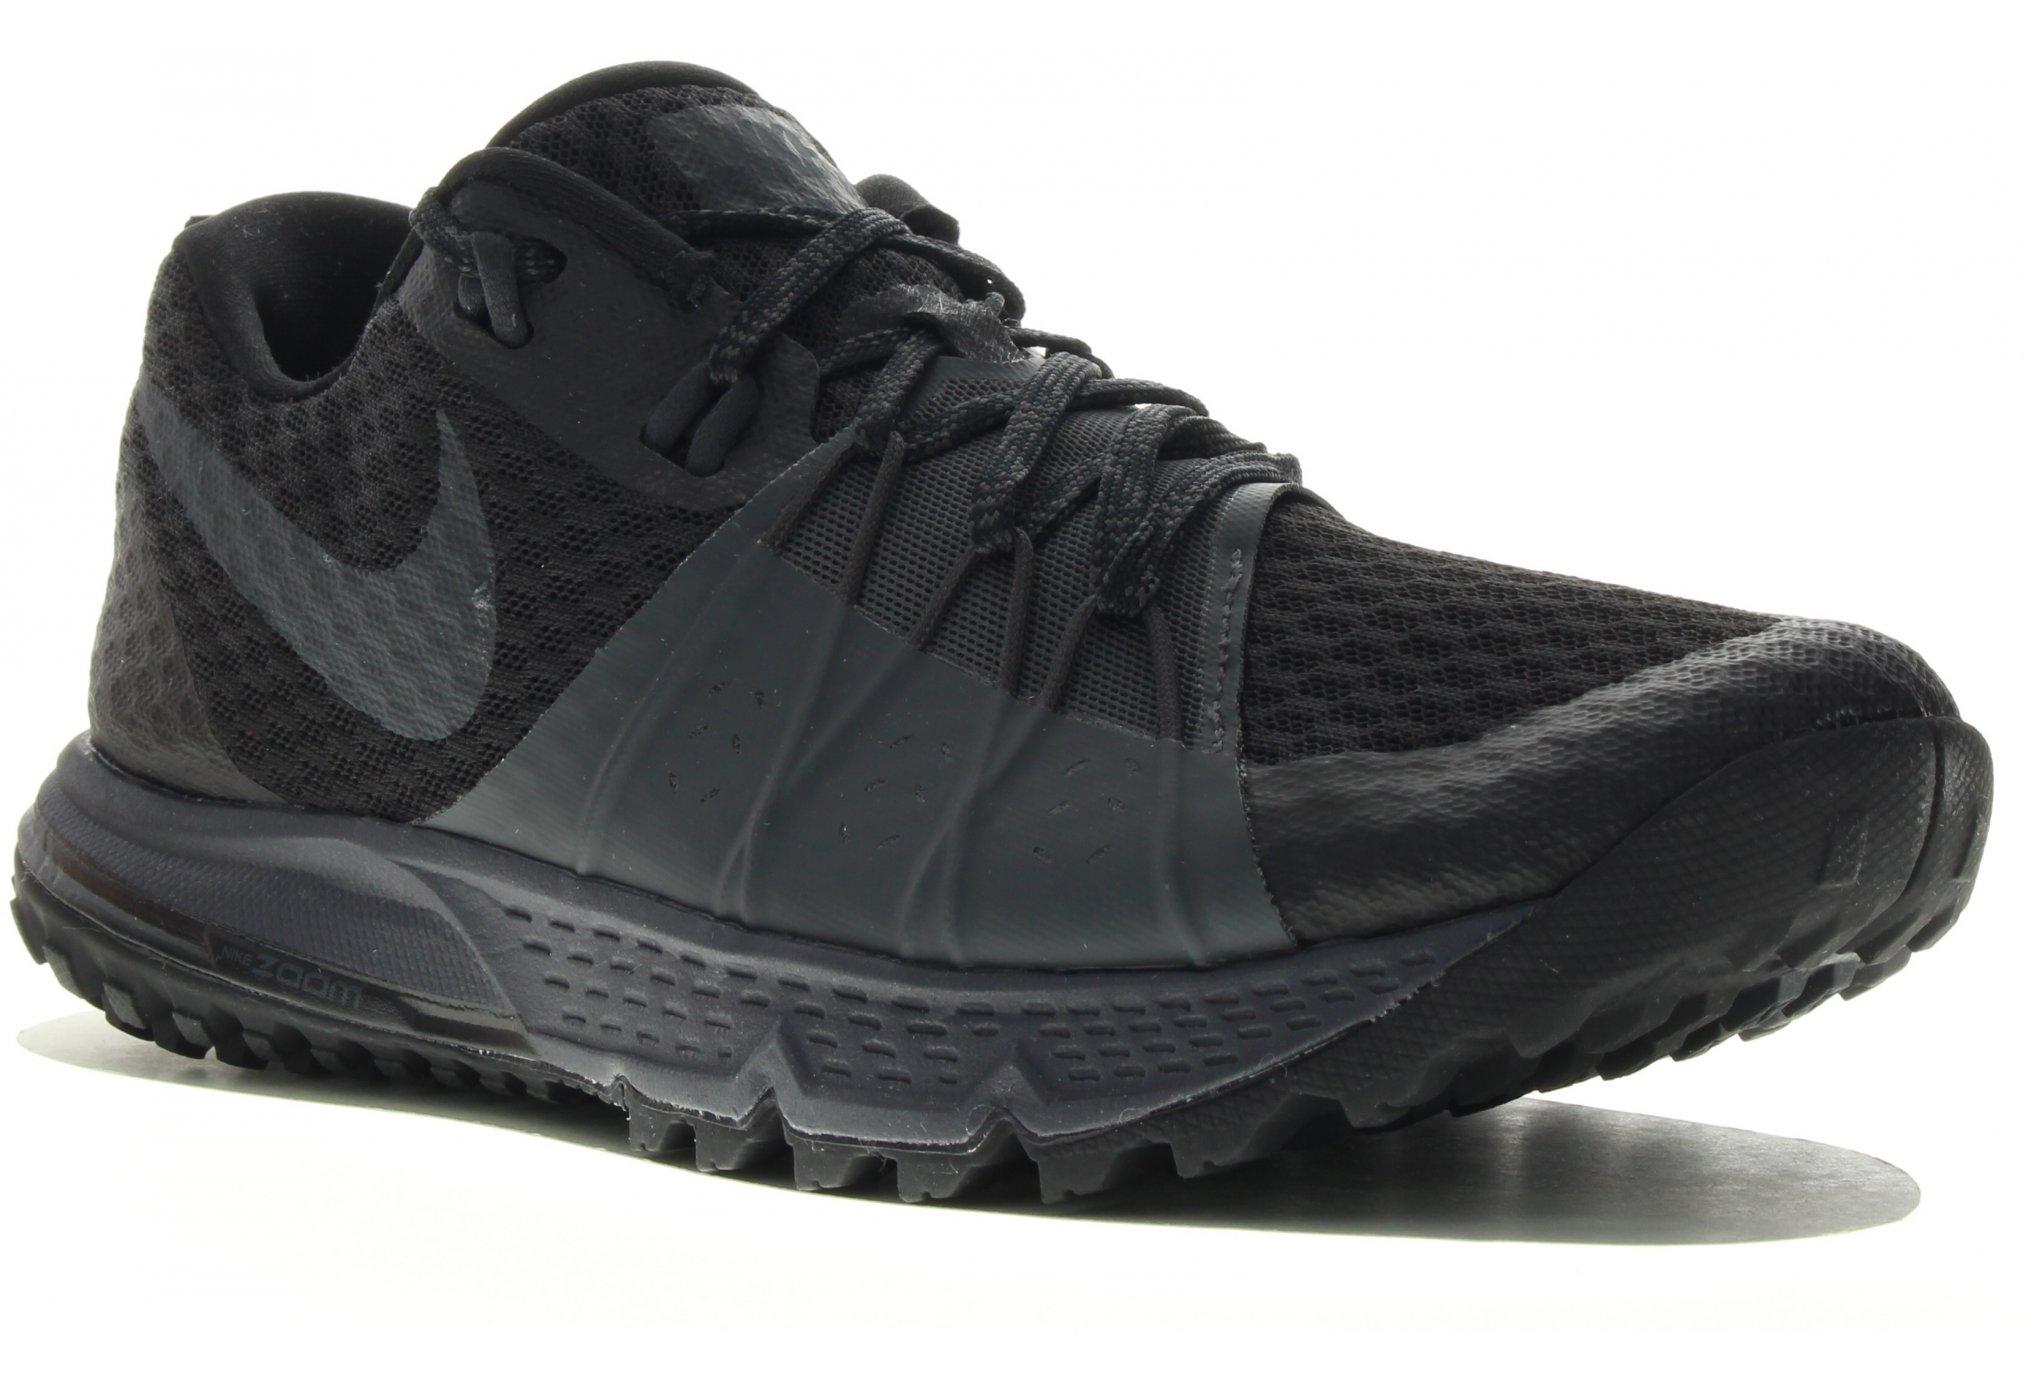 taille 40 b6b15 1a80b Nike Trail achat / vente de Nike pas cher